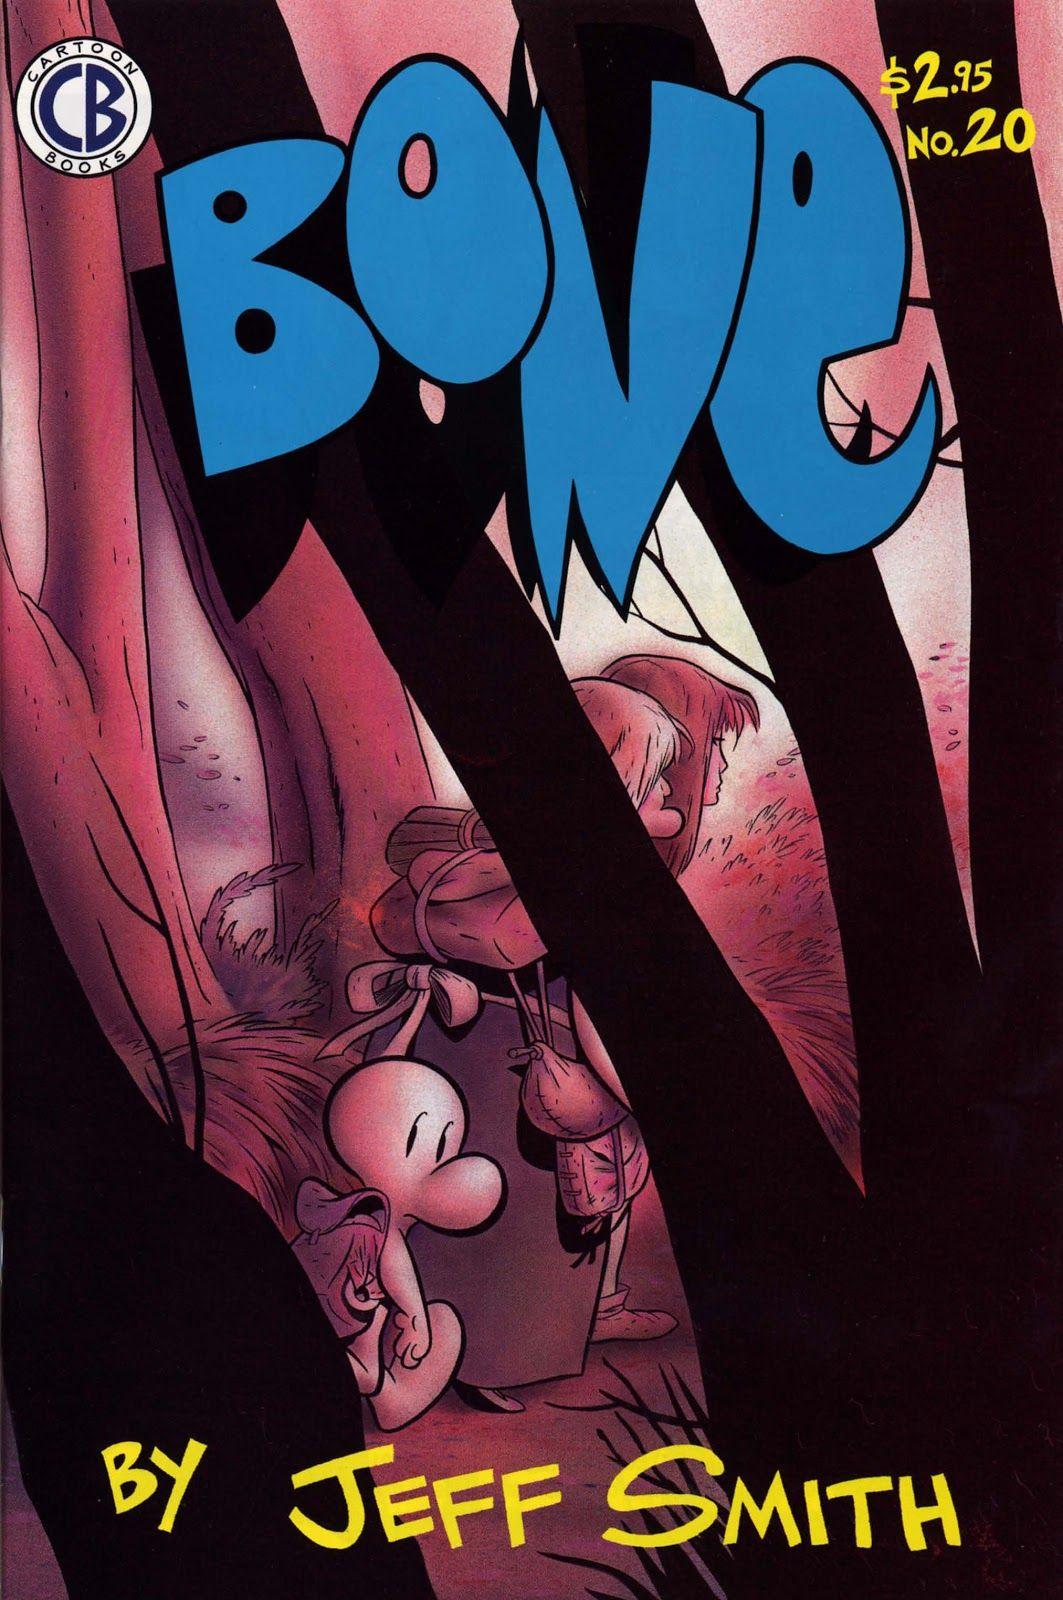 Bone 1991 Issue 20 Read Bone 1991 Issue 20 Comic Online In High Quality Cartoon Books Bone Comic Indie Comic